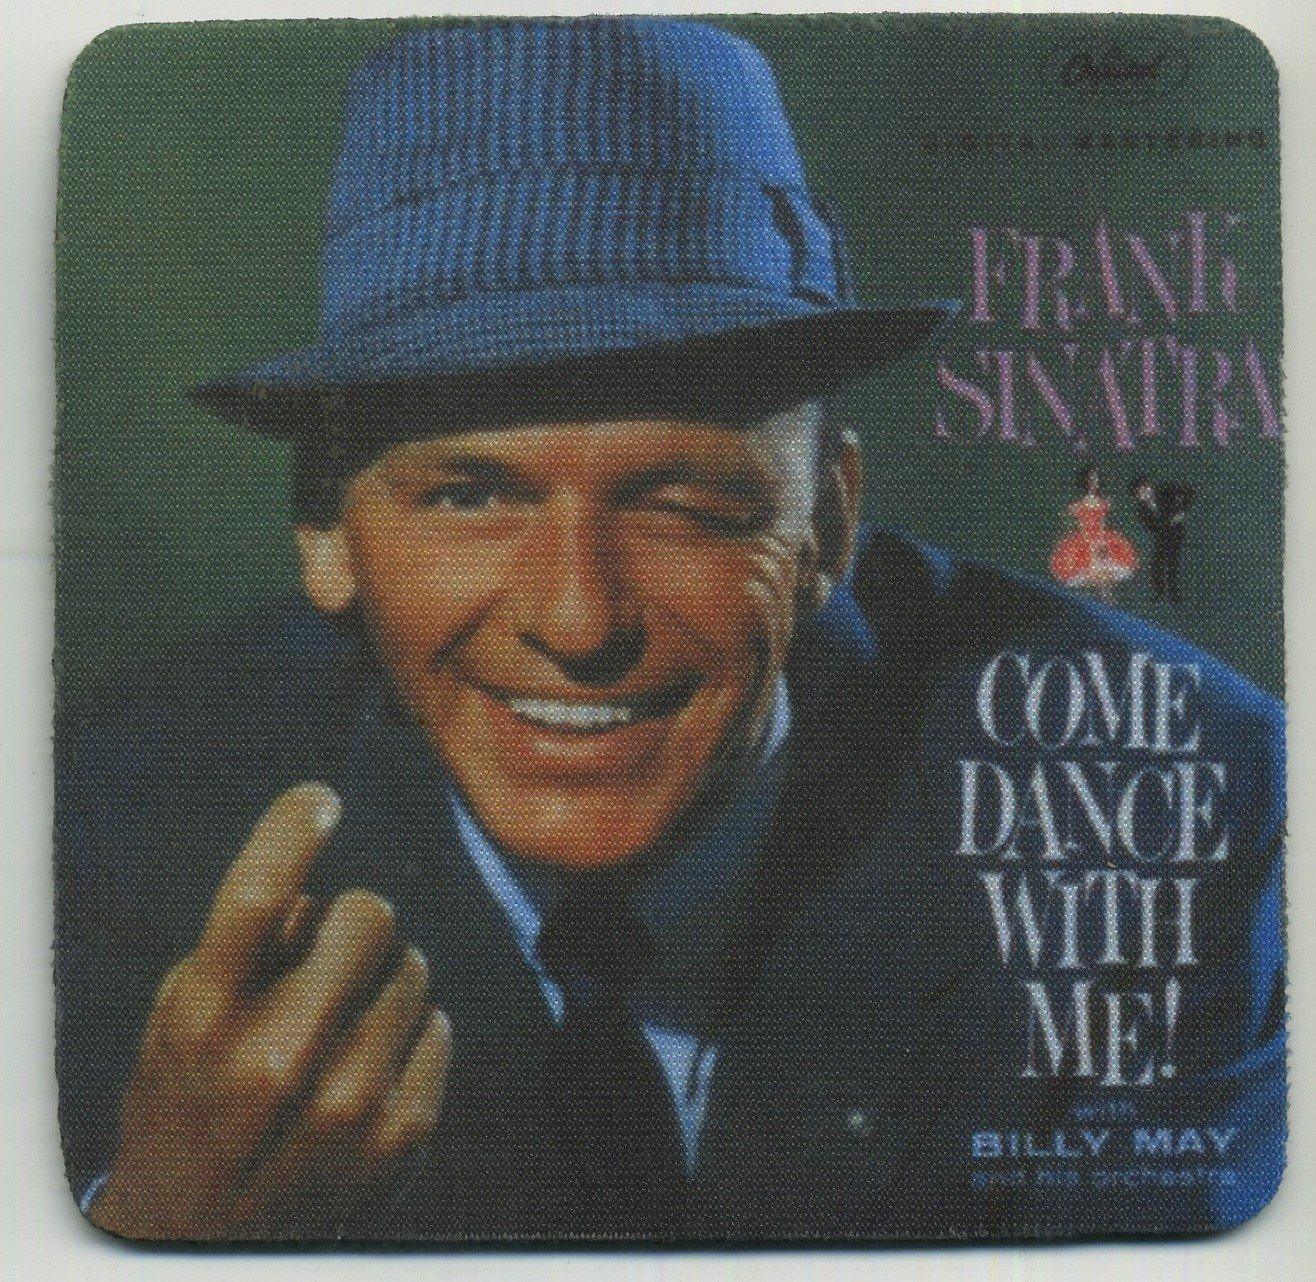 Frank Sinatra Come Dance with Me - Album Coaster Set of 4 -